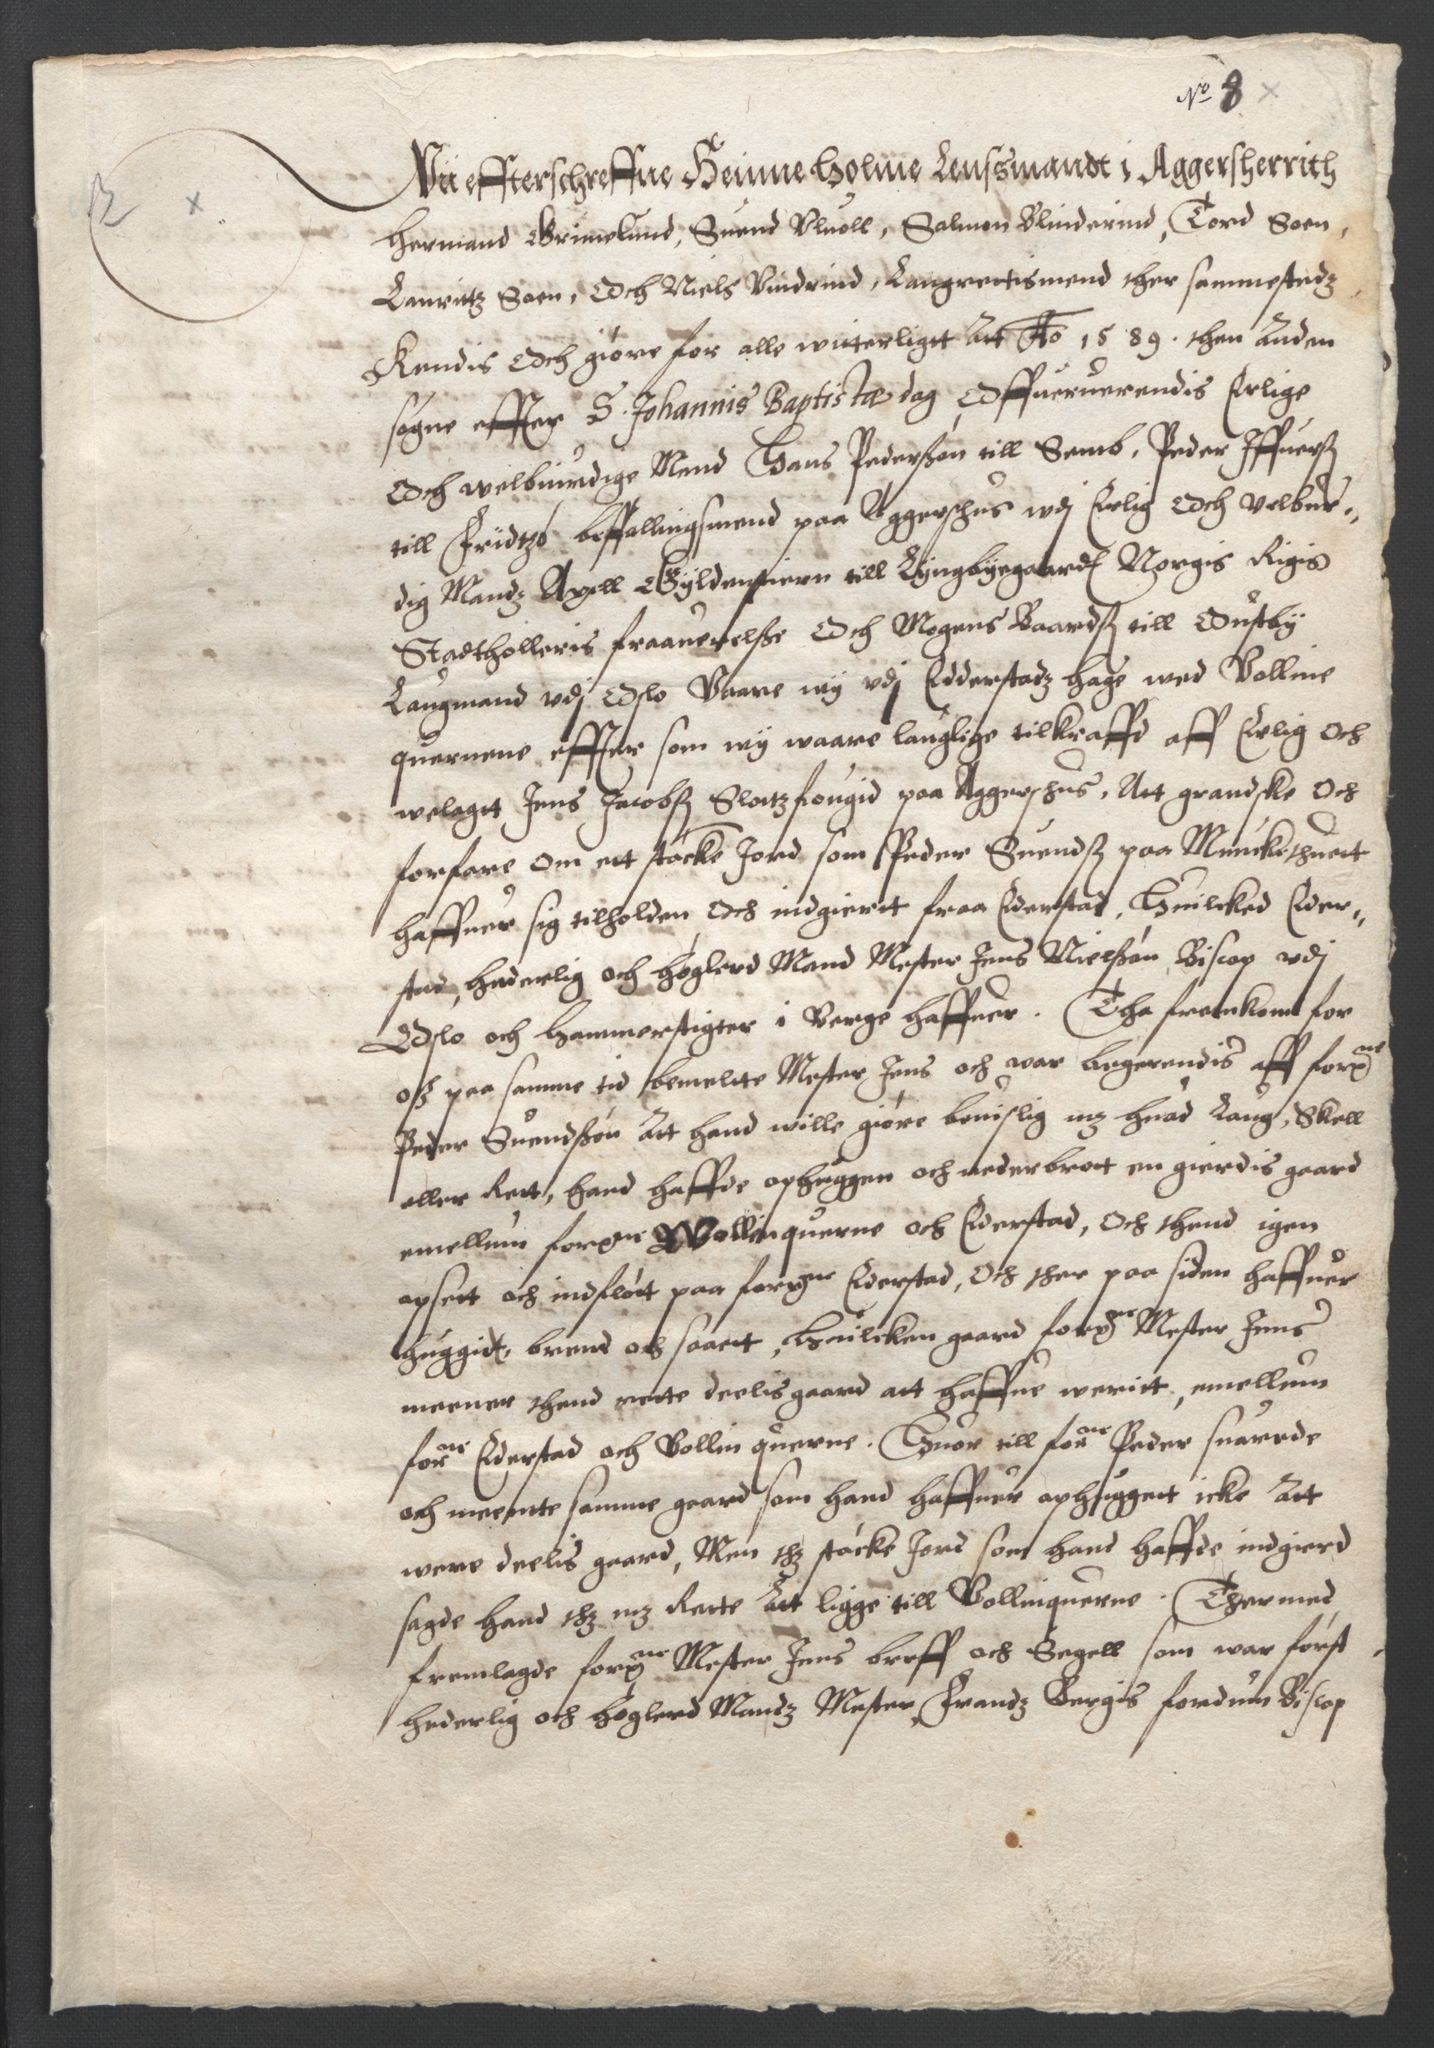 SAO, Oslo stiftsdireksjon, G/Gb/L0001: Bispestolens dokumenter, 1584-1612, s. 8